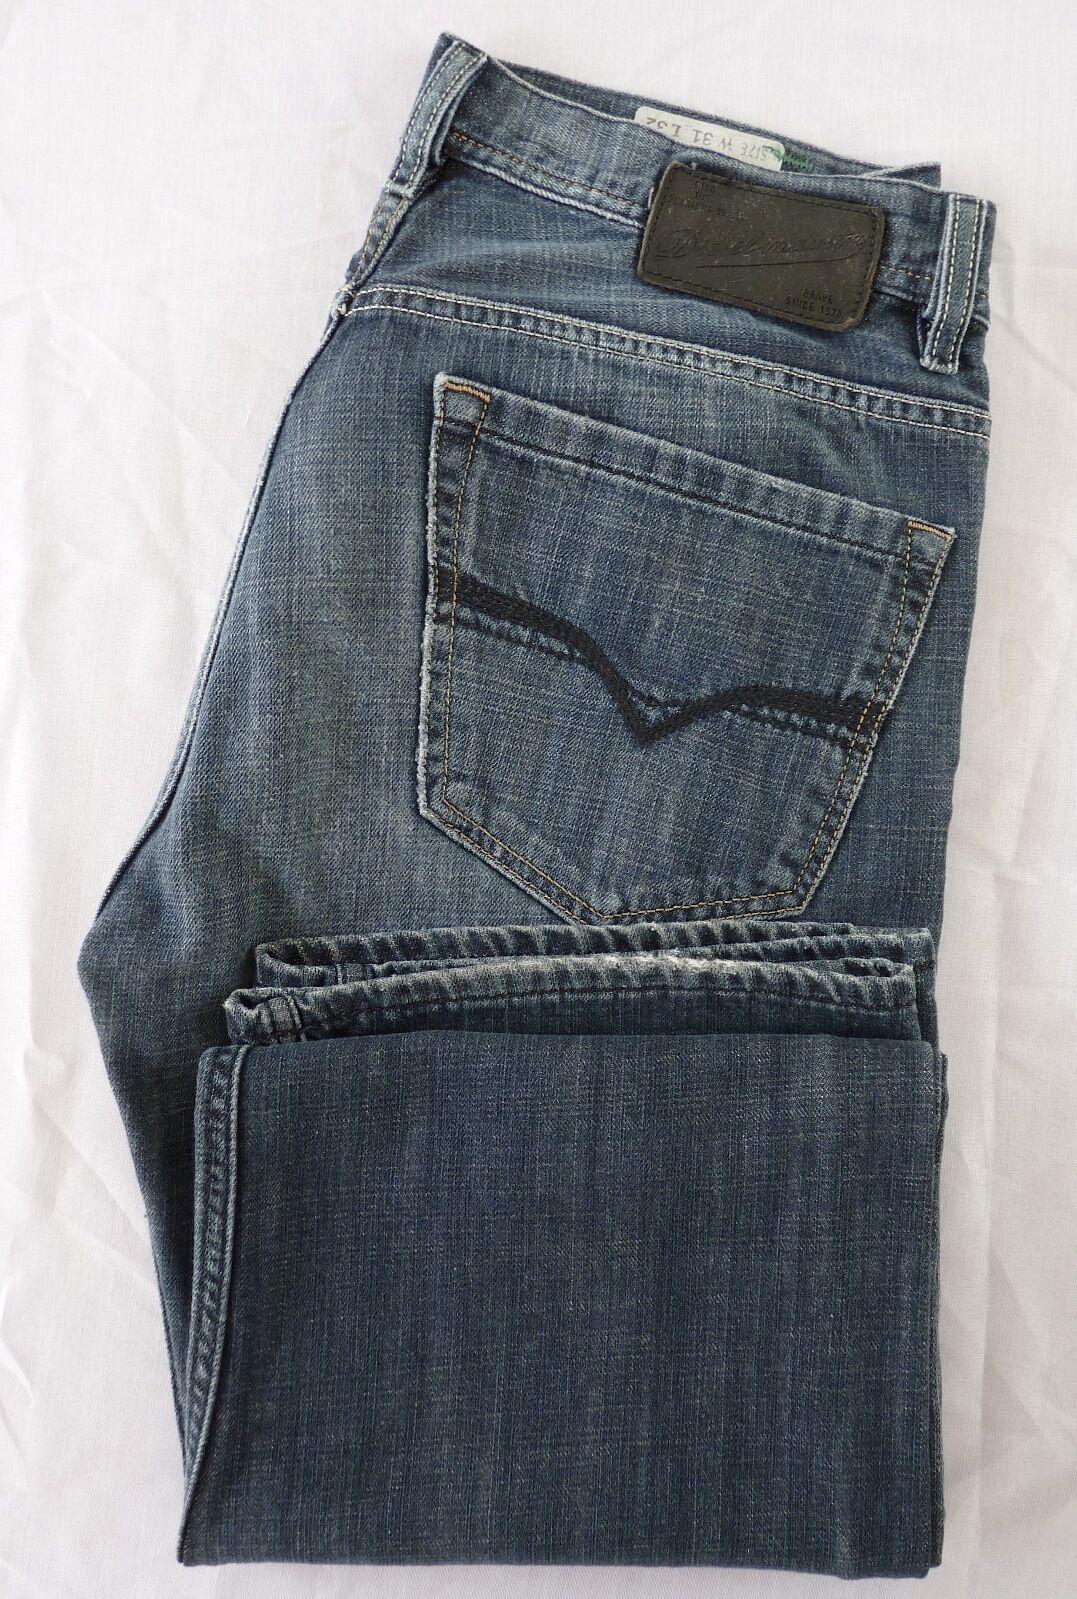 Diesel Quratt 008FI Straight Leg Button Fly Jeans 100% Cotton Size 31  MINT